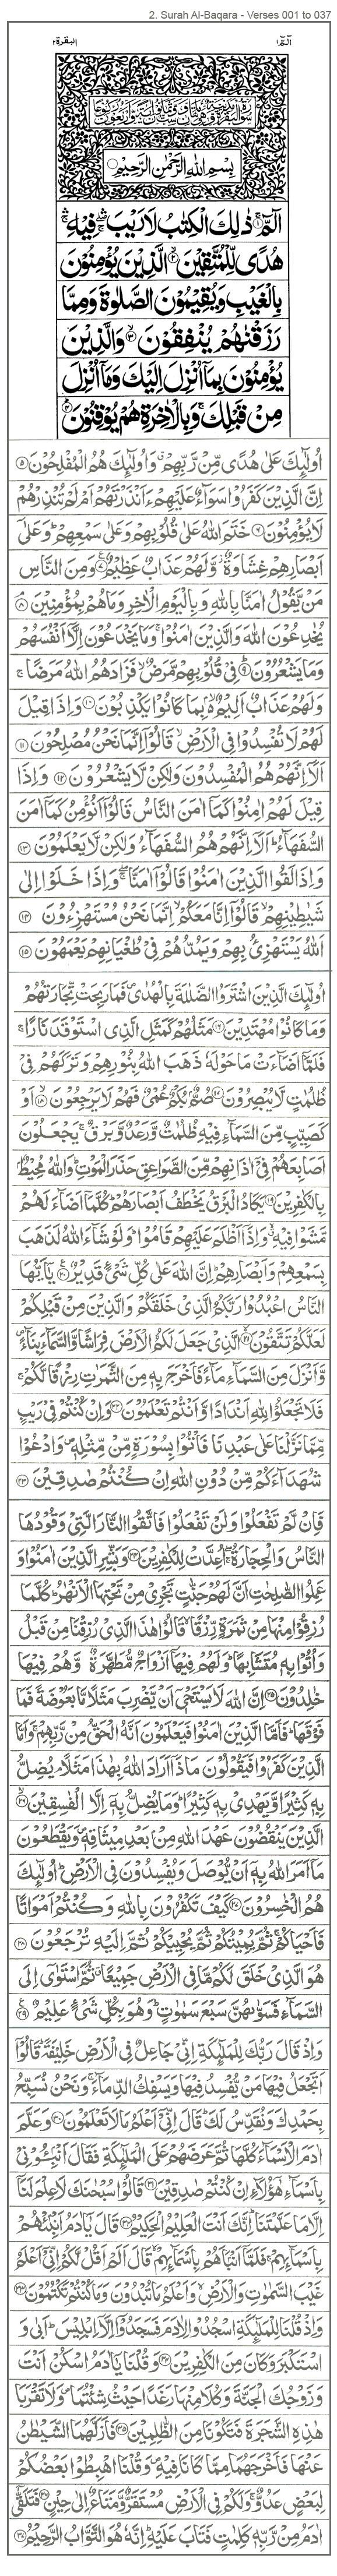 2. Surah Al-Baqara - Verses 001 to 037